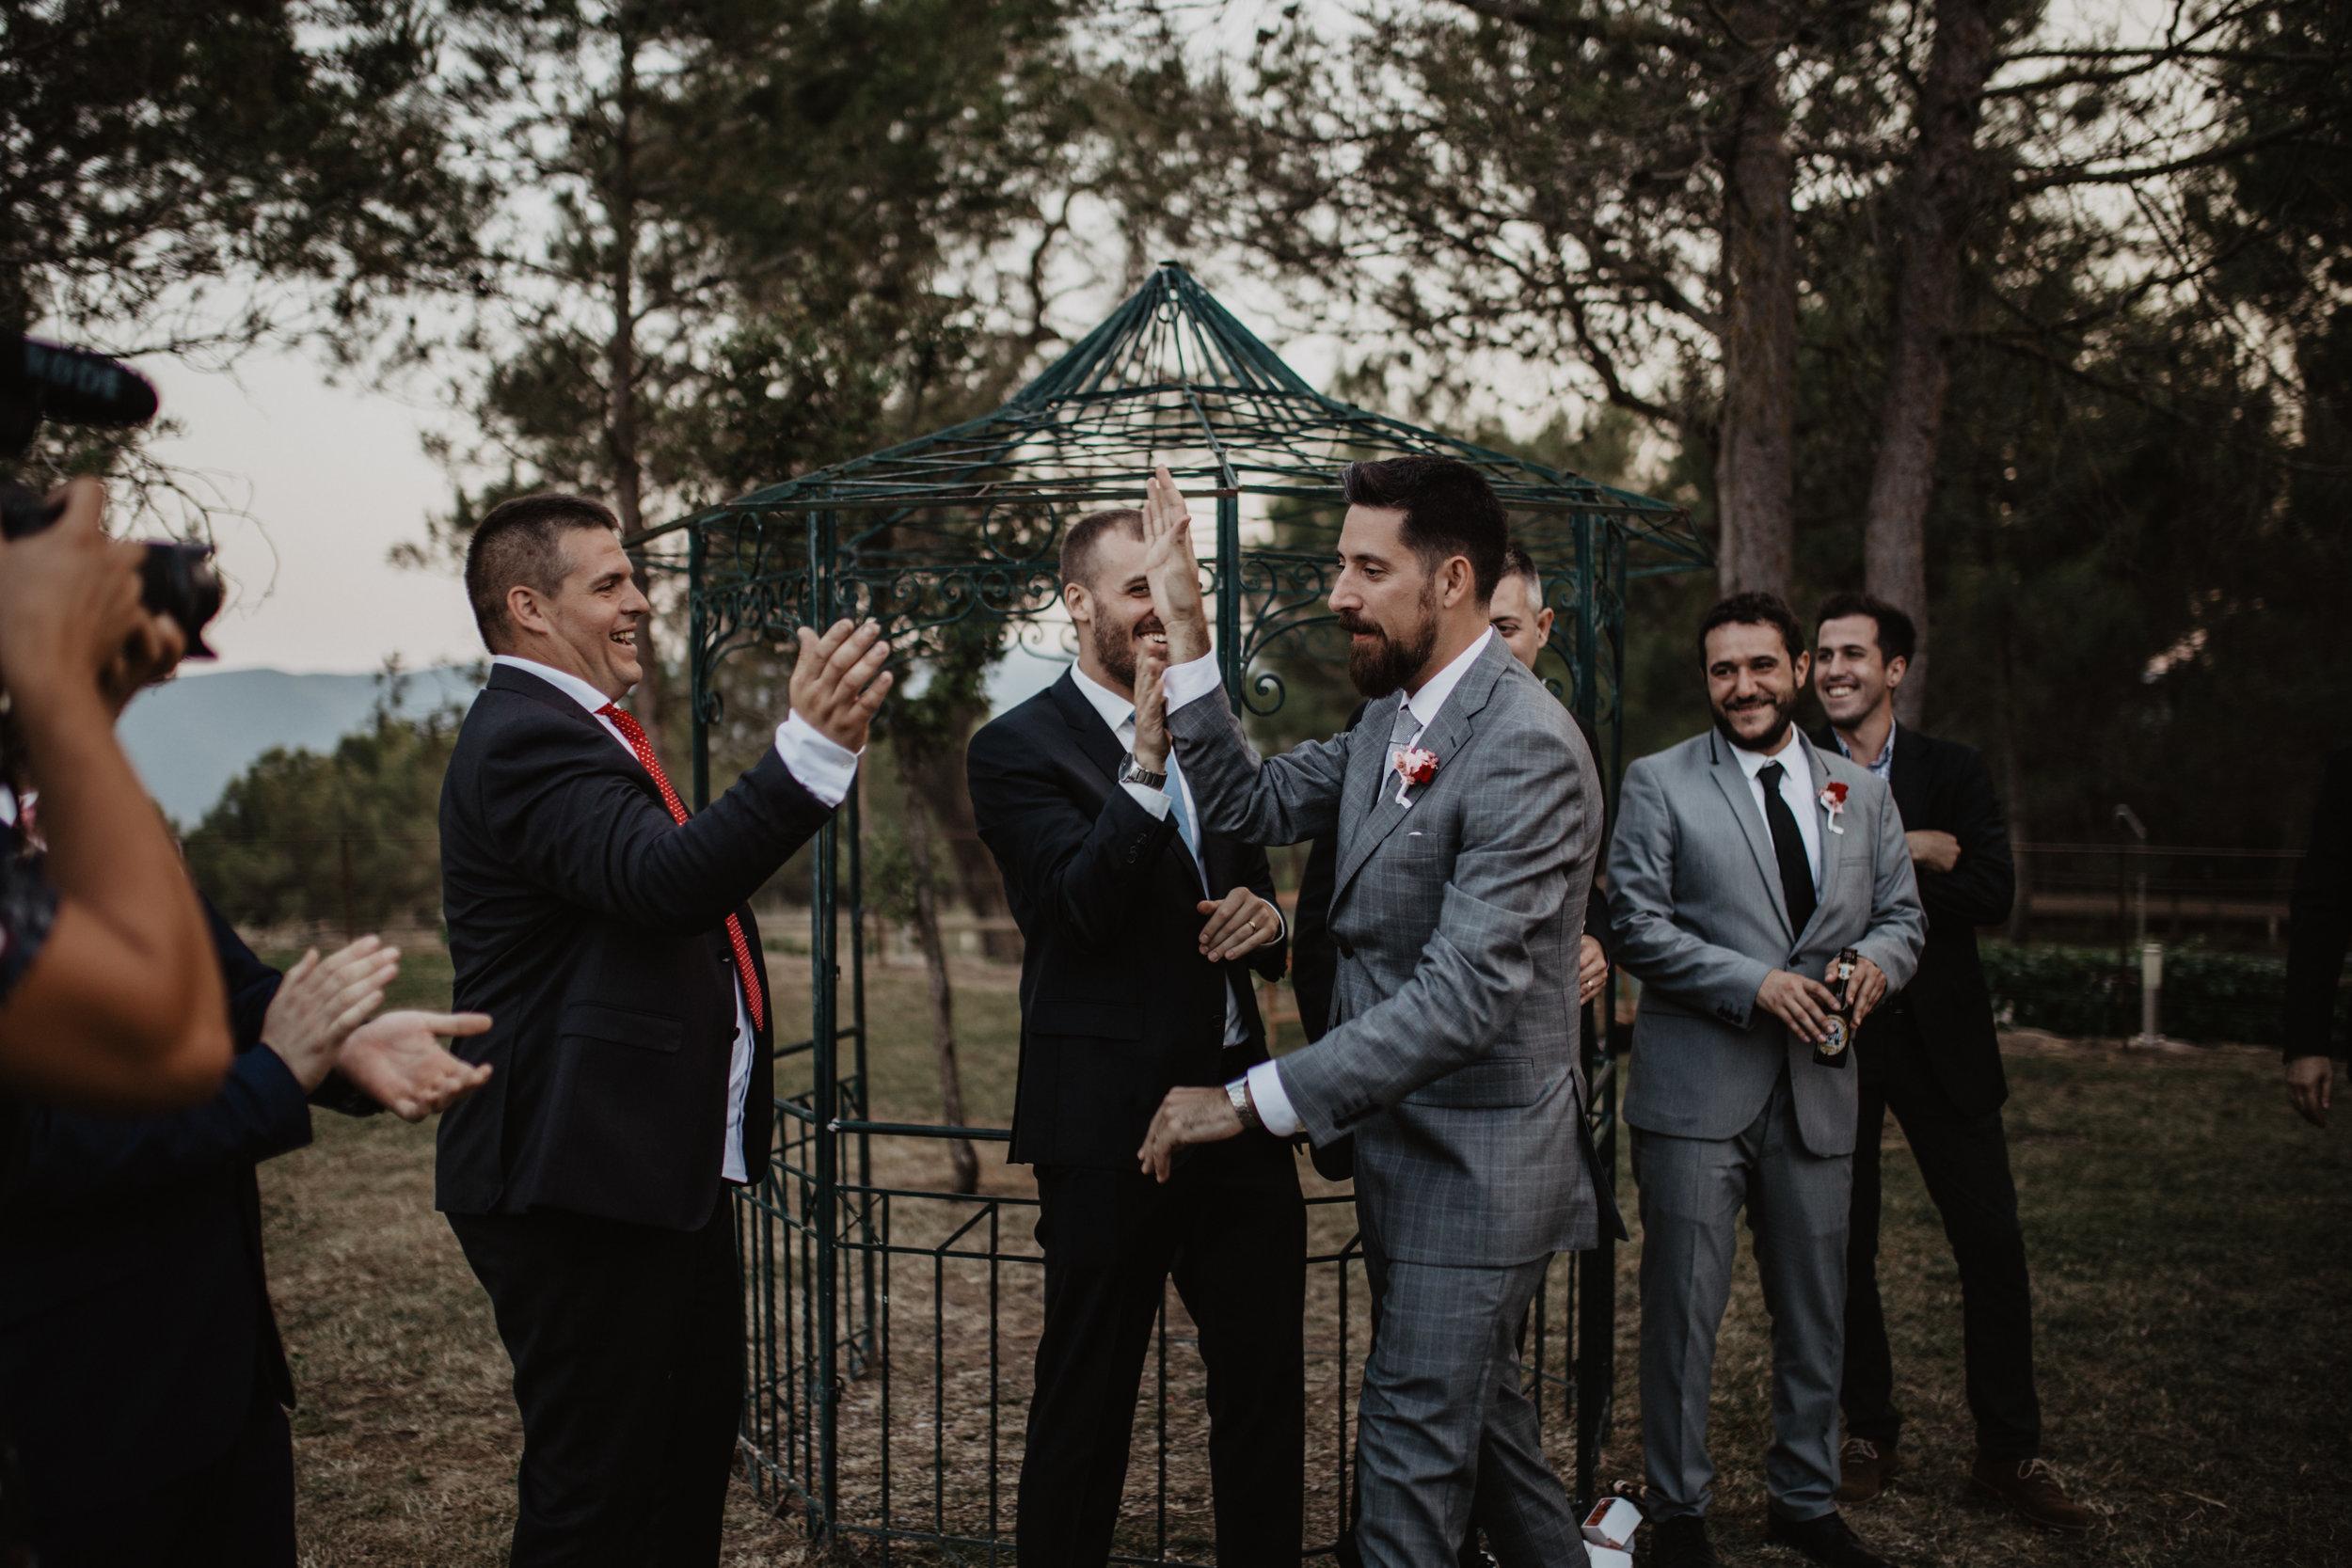 thenortherngirlphotography_photography_thenortherngirl_rebeccascabros_wedding_weddingphotography_masialagarrigadecastelladral_joaniemma_bodaenbarcelona_weddingphotographer_emmaijoan-673.jpg